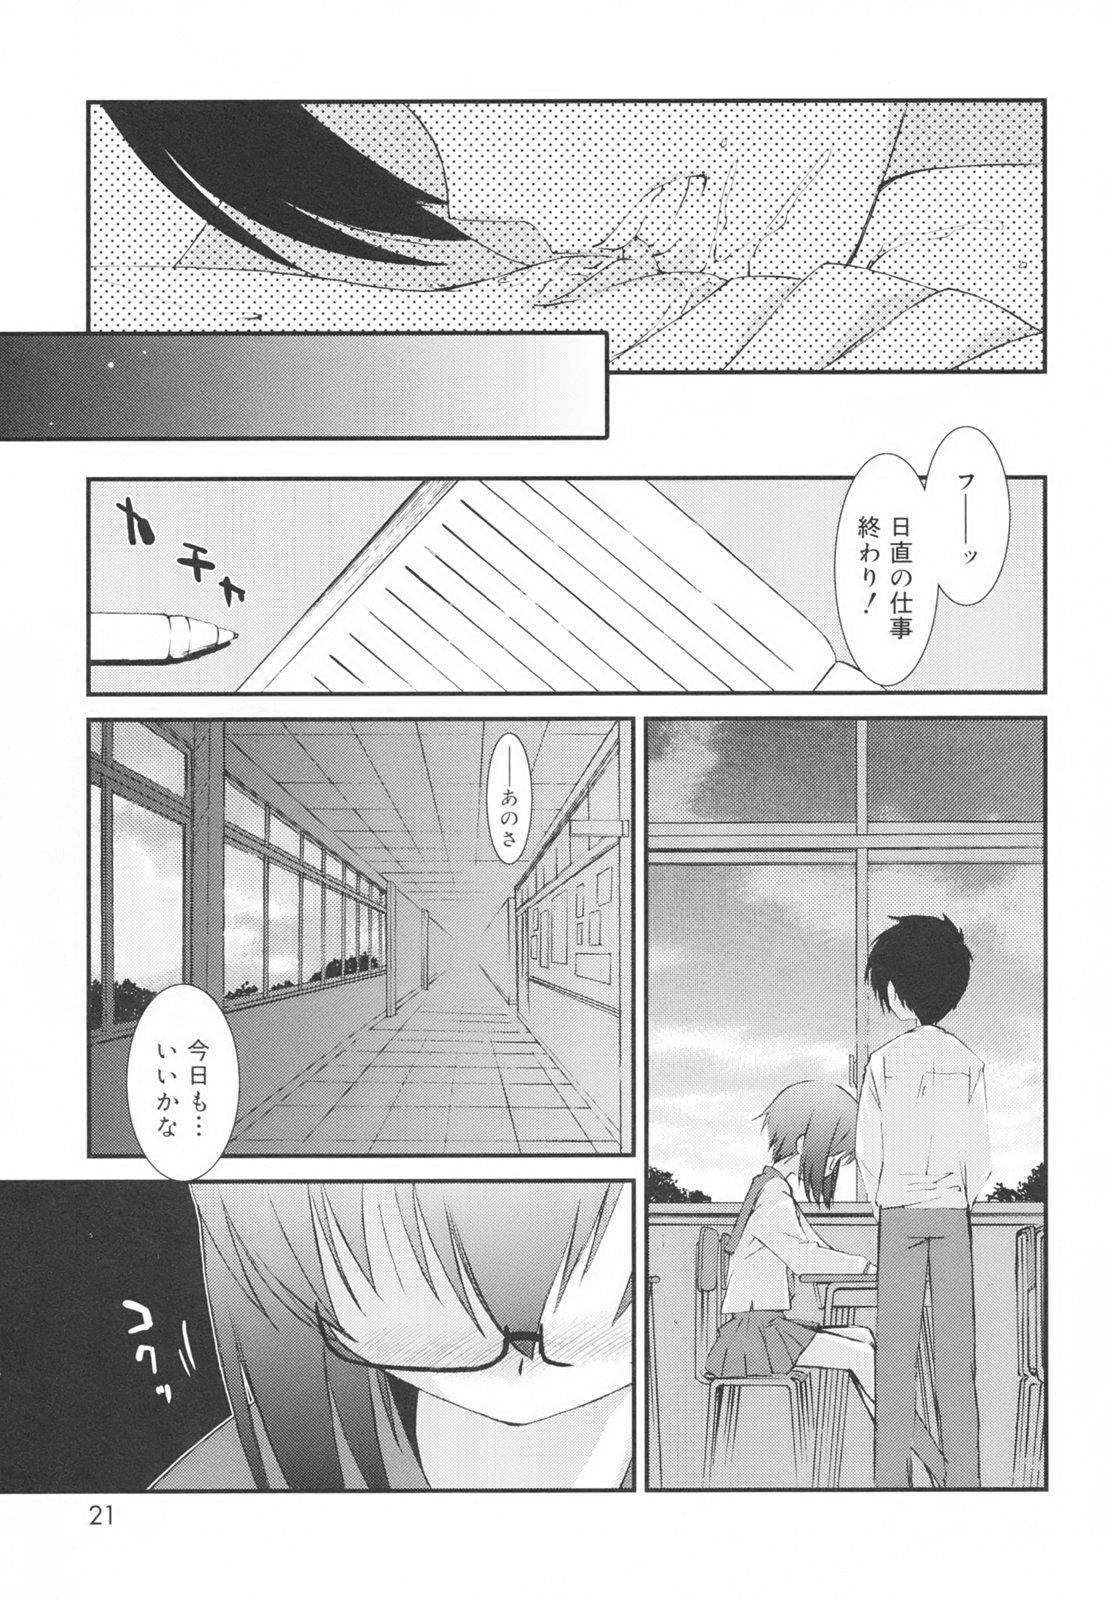 Gakkou No Nai Hi - A Day without School 24